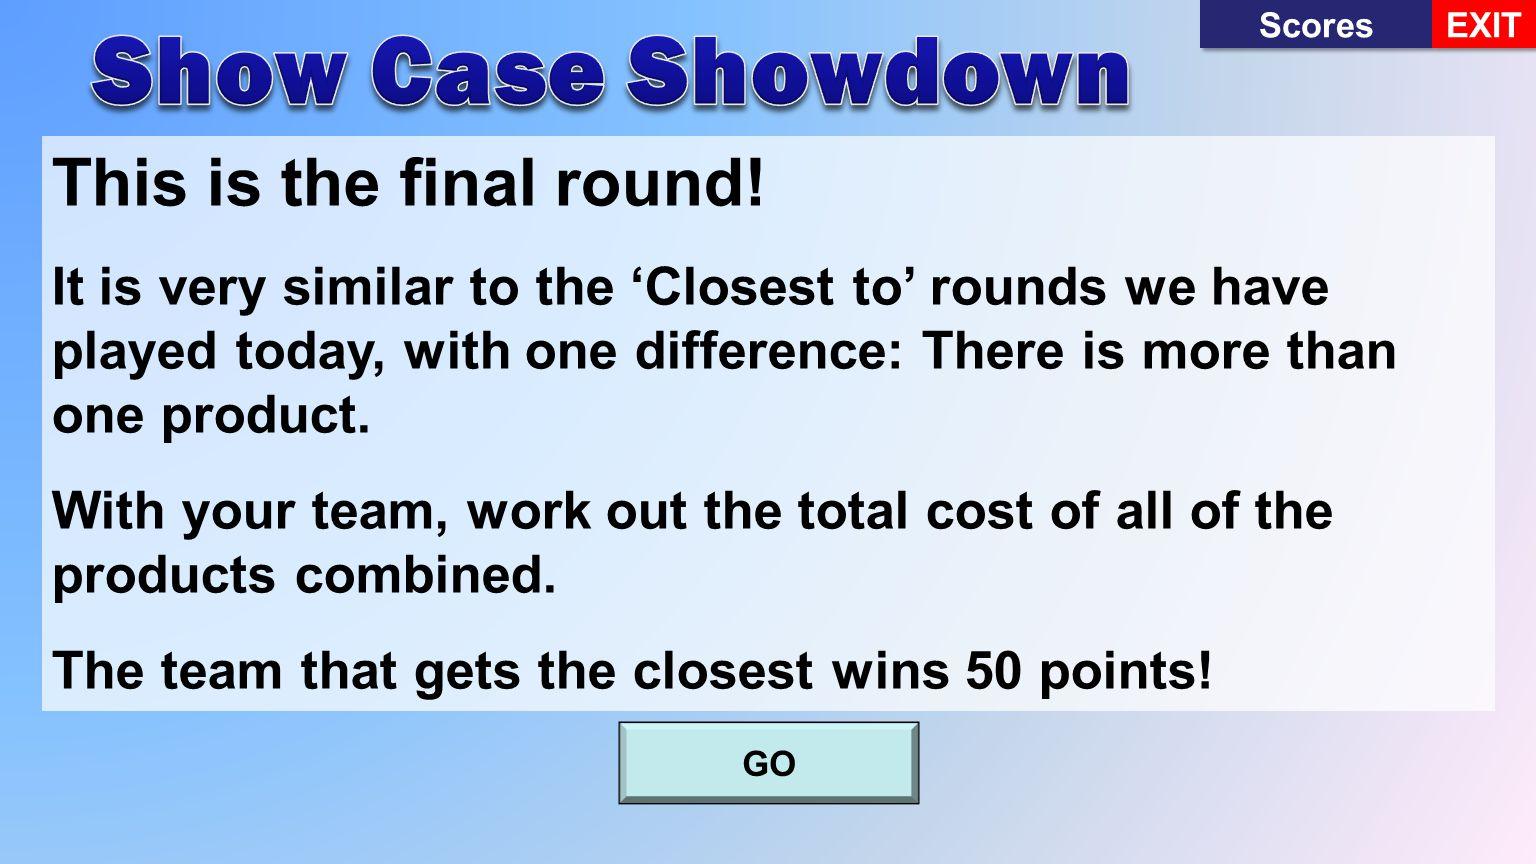 Scores EXIT 7480Won10900Won6900Won You chose 1You chose 2you chose 3 Continue Incorrect 